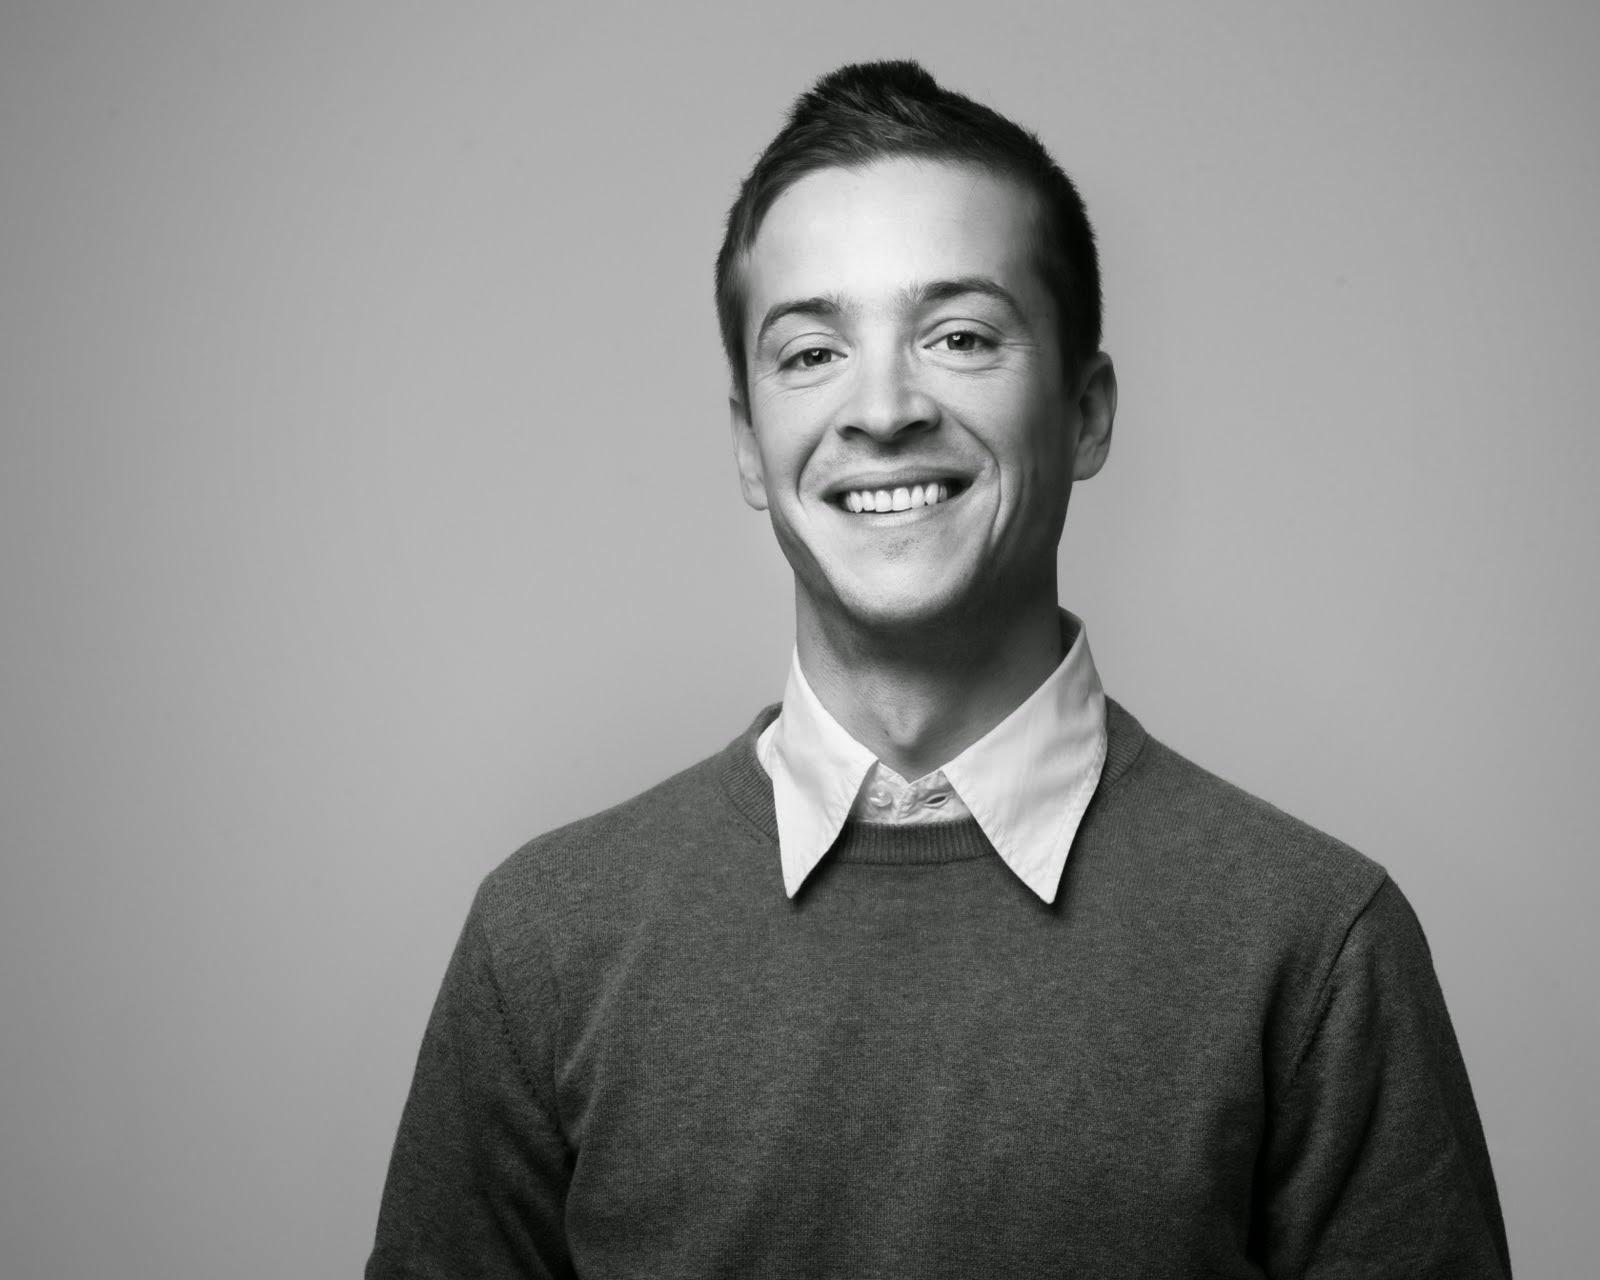 Marco Sargenti